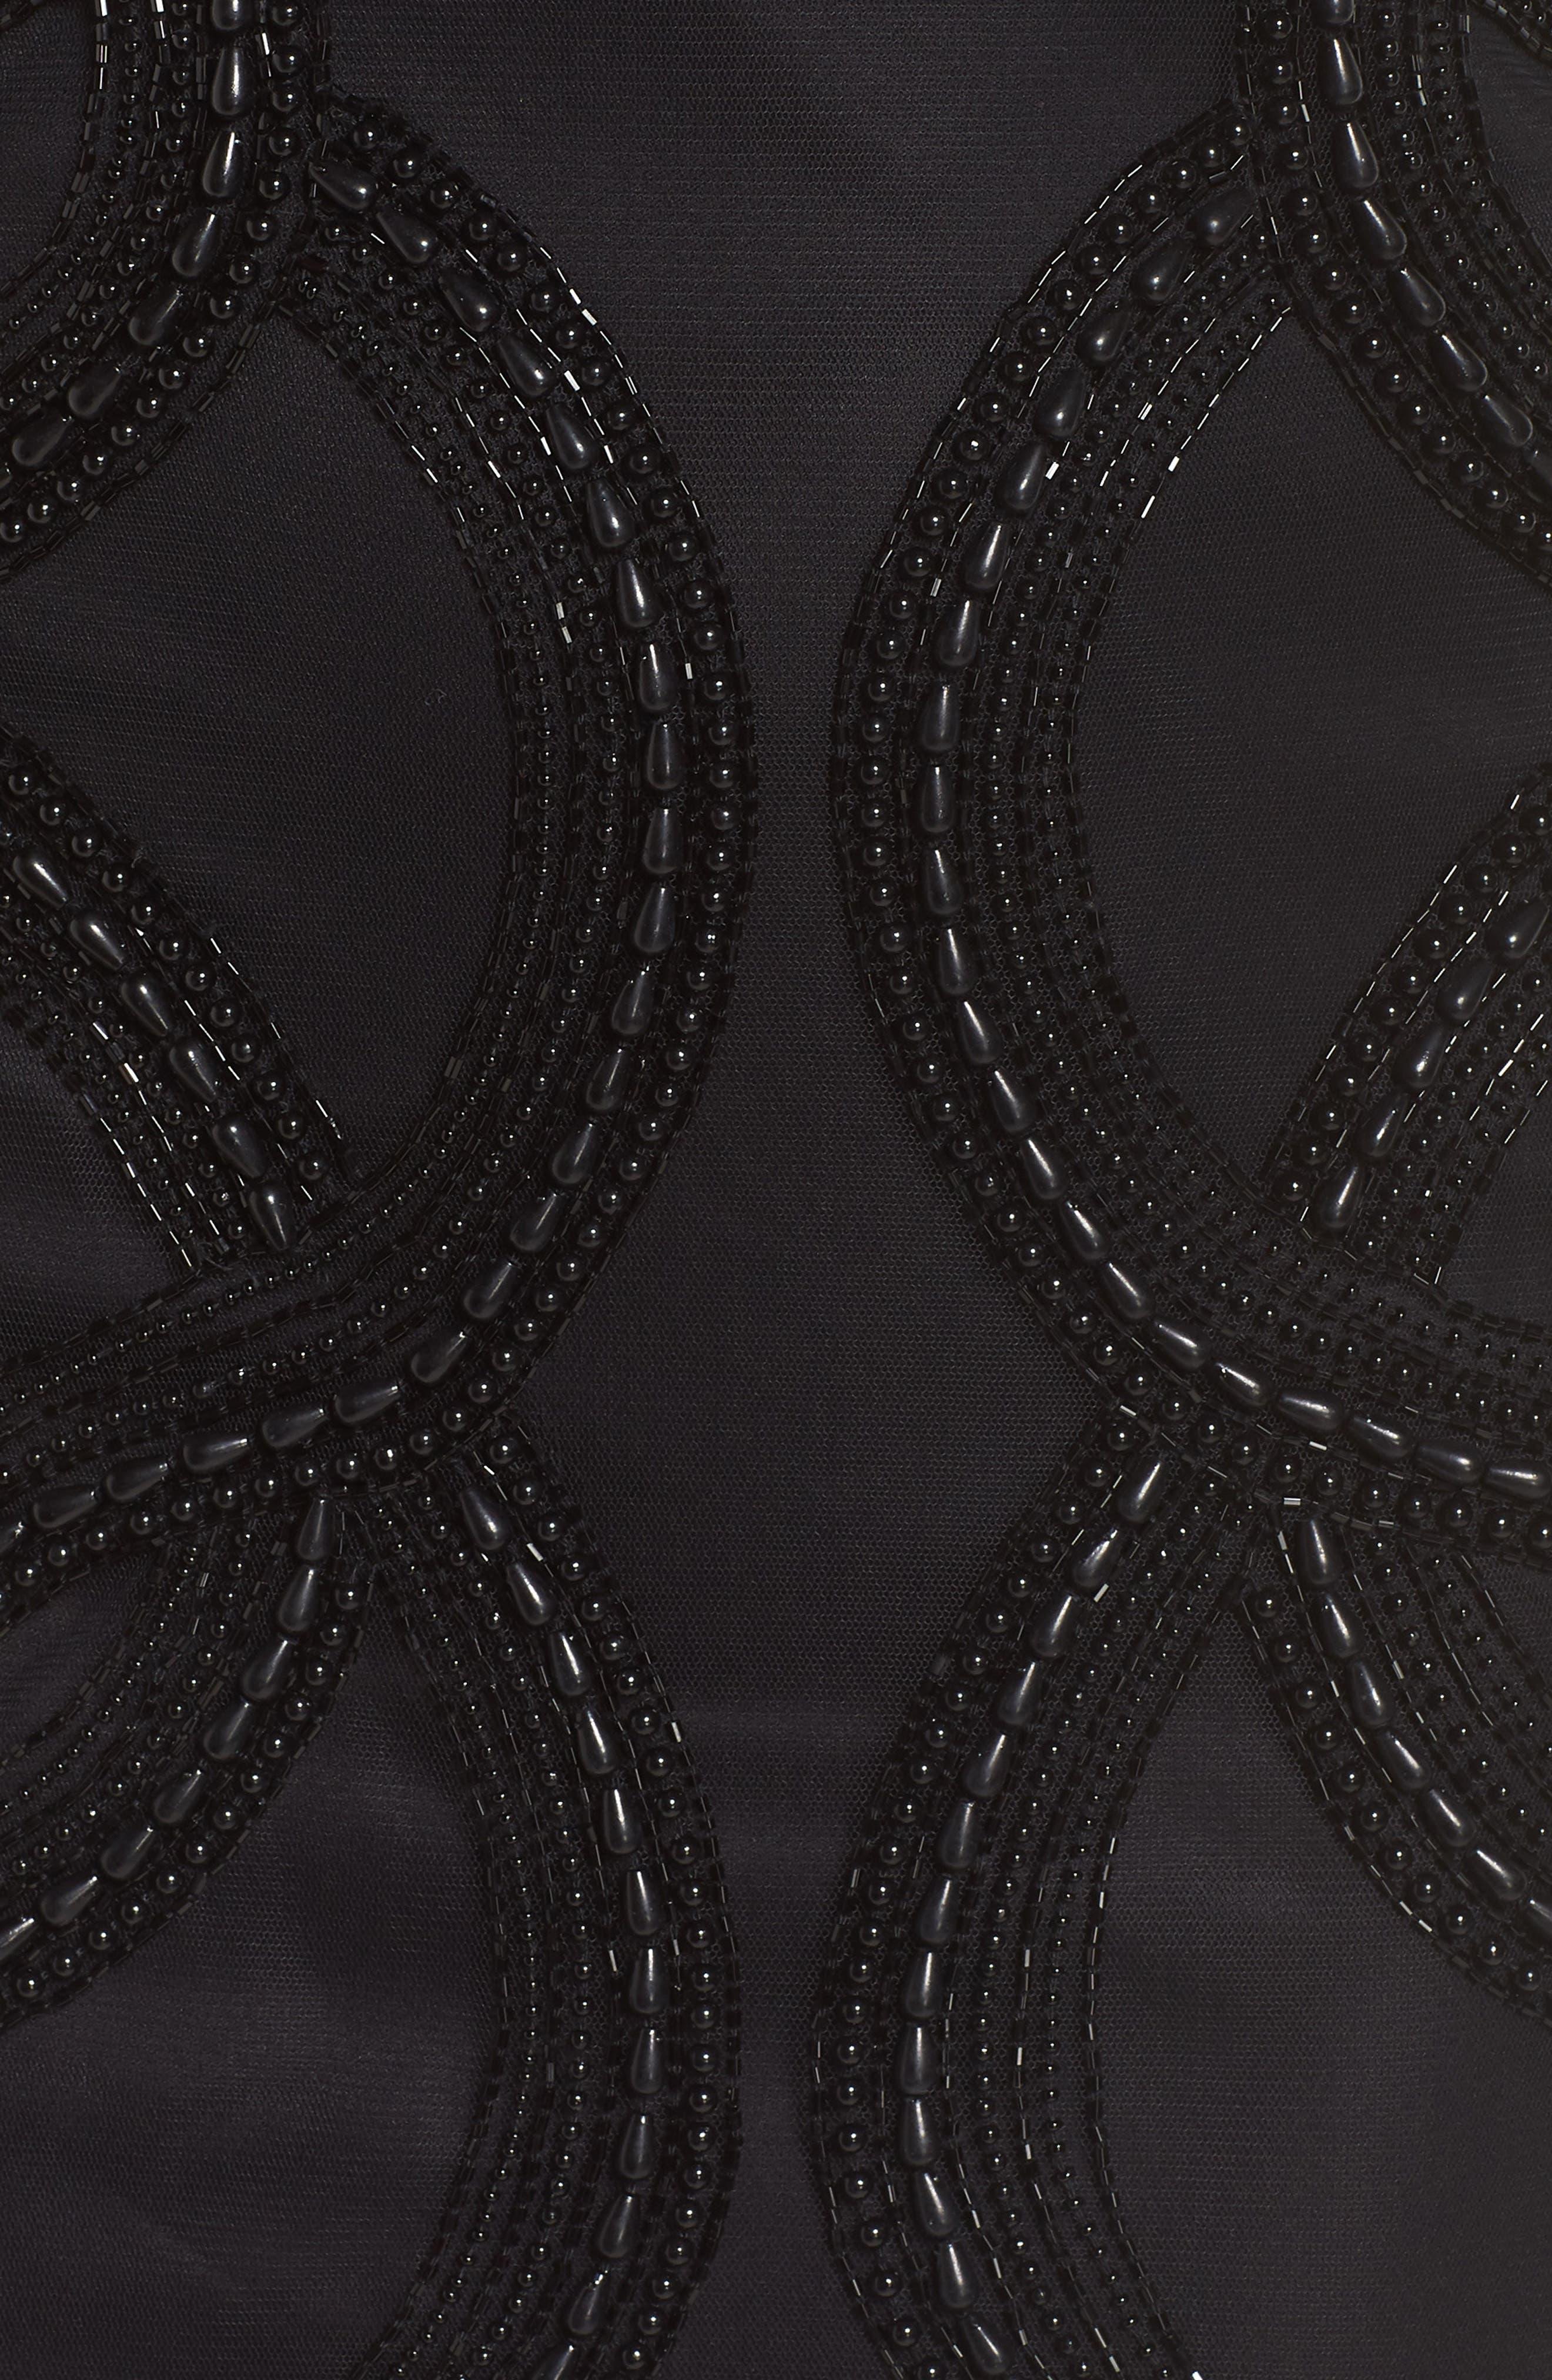 Beaded Swirls Cocktail Dress,                             Alternate thumbnail 6, color,                             BLACK